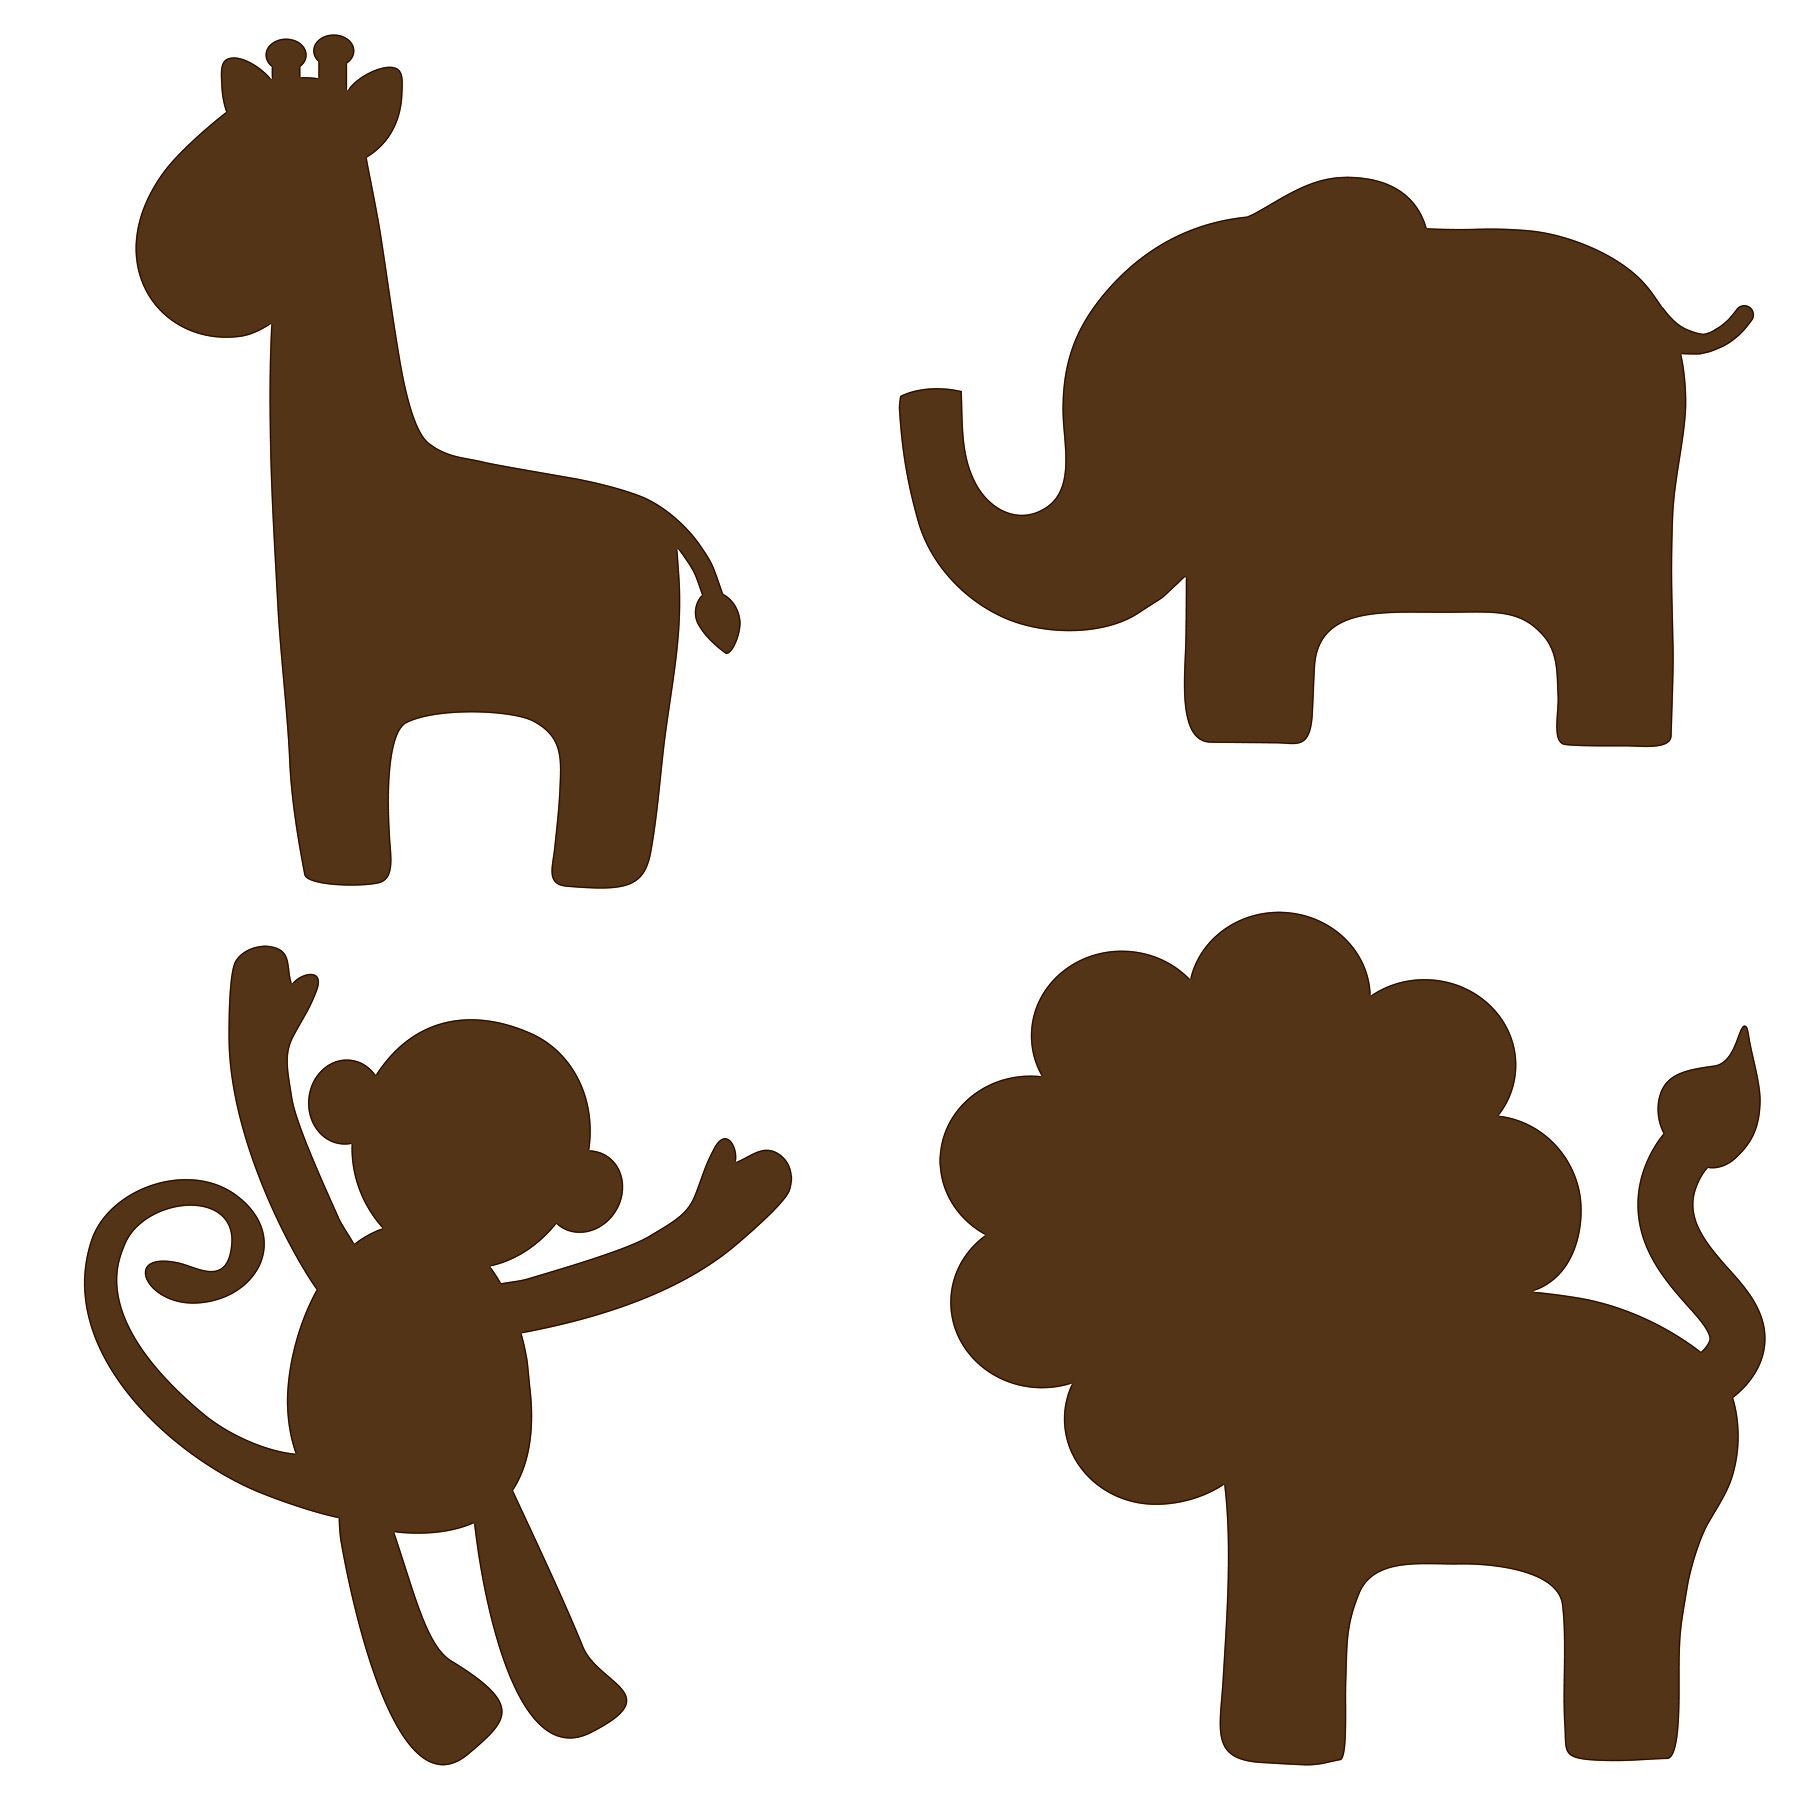 safari animal silhouette clip art at getdrawings com free for rh getdrawings com safari hat clipart free free safari clipart images